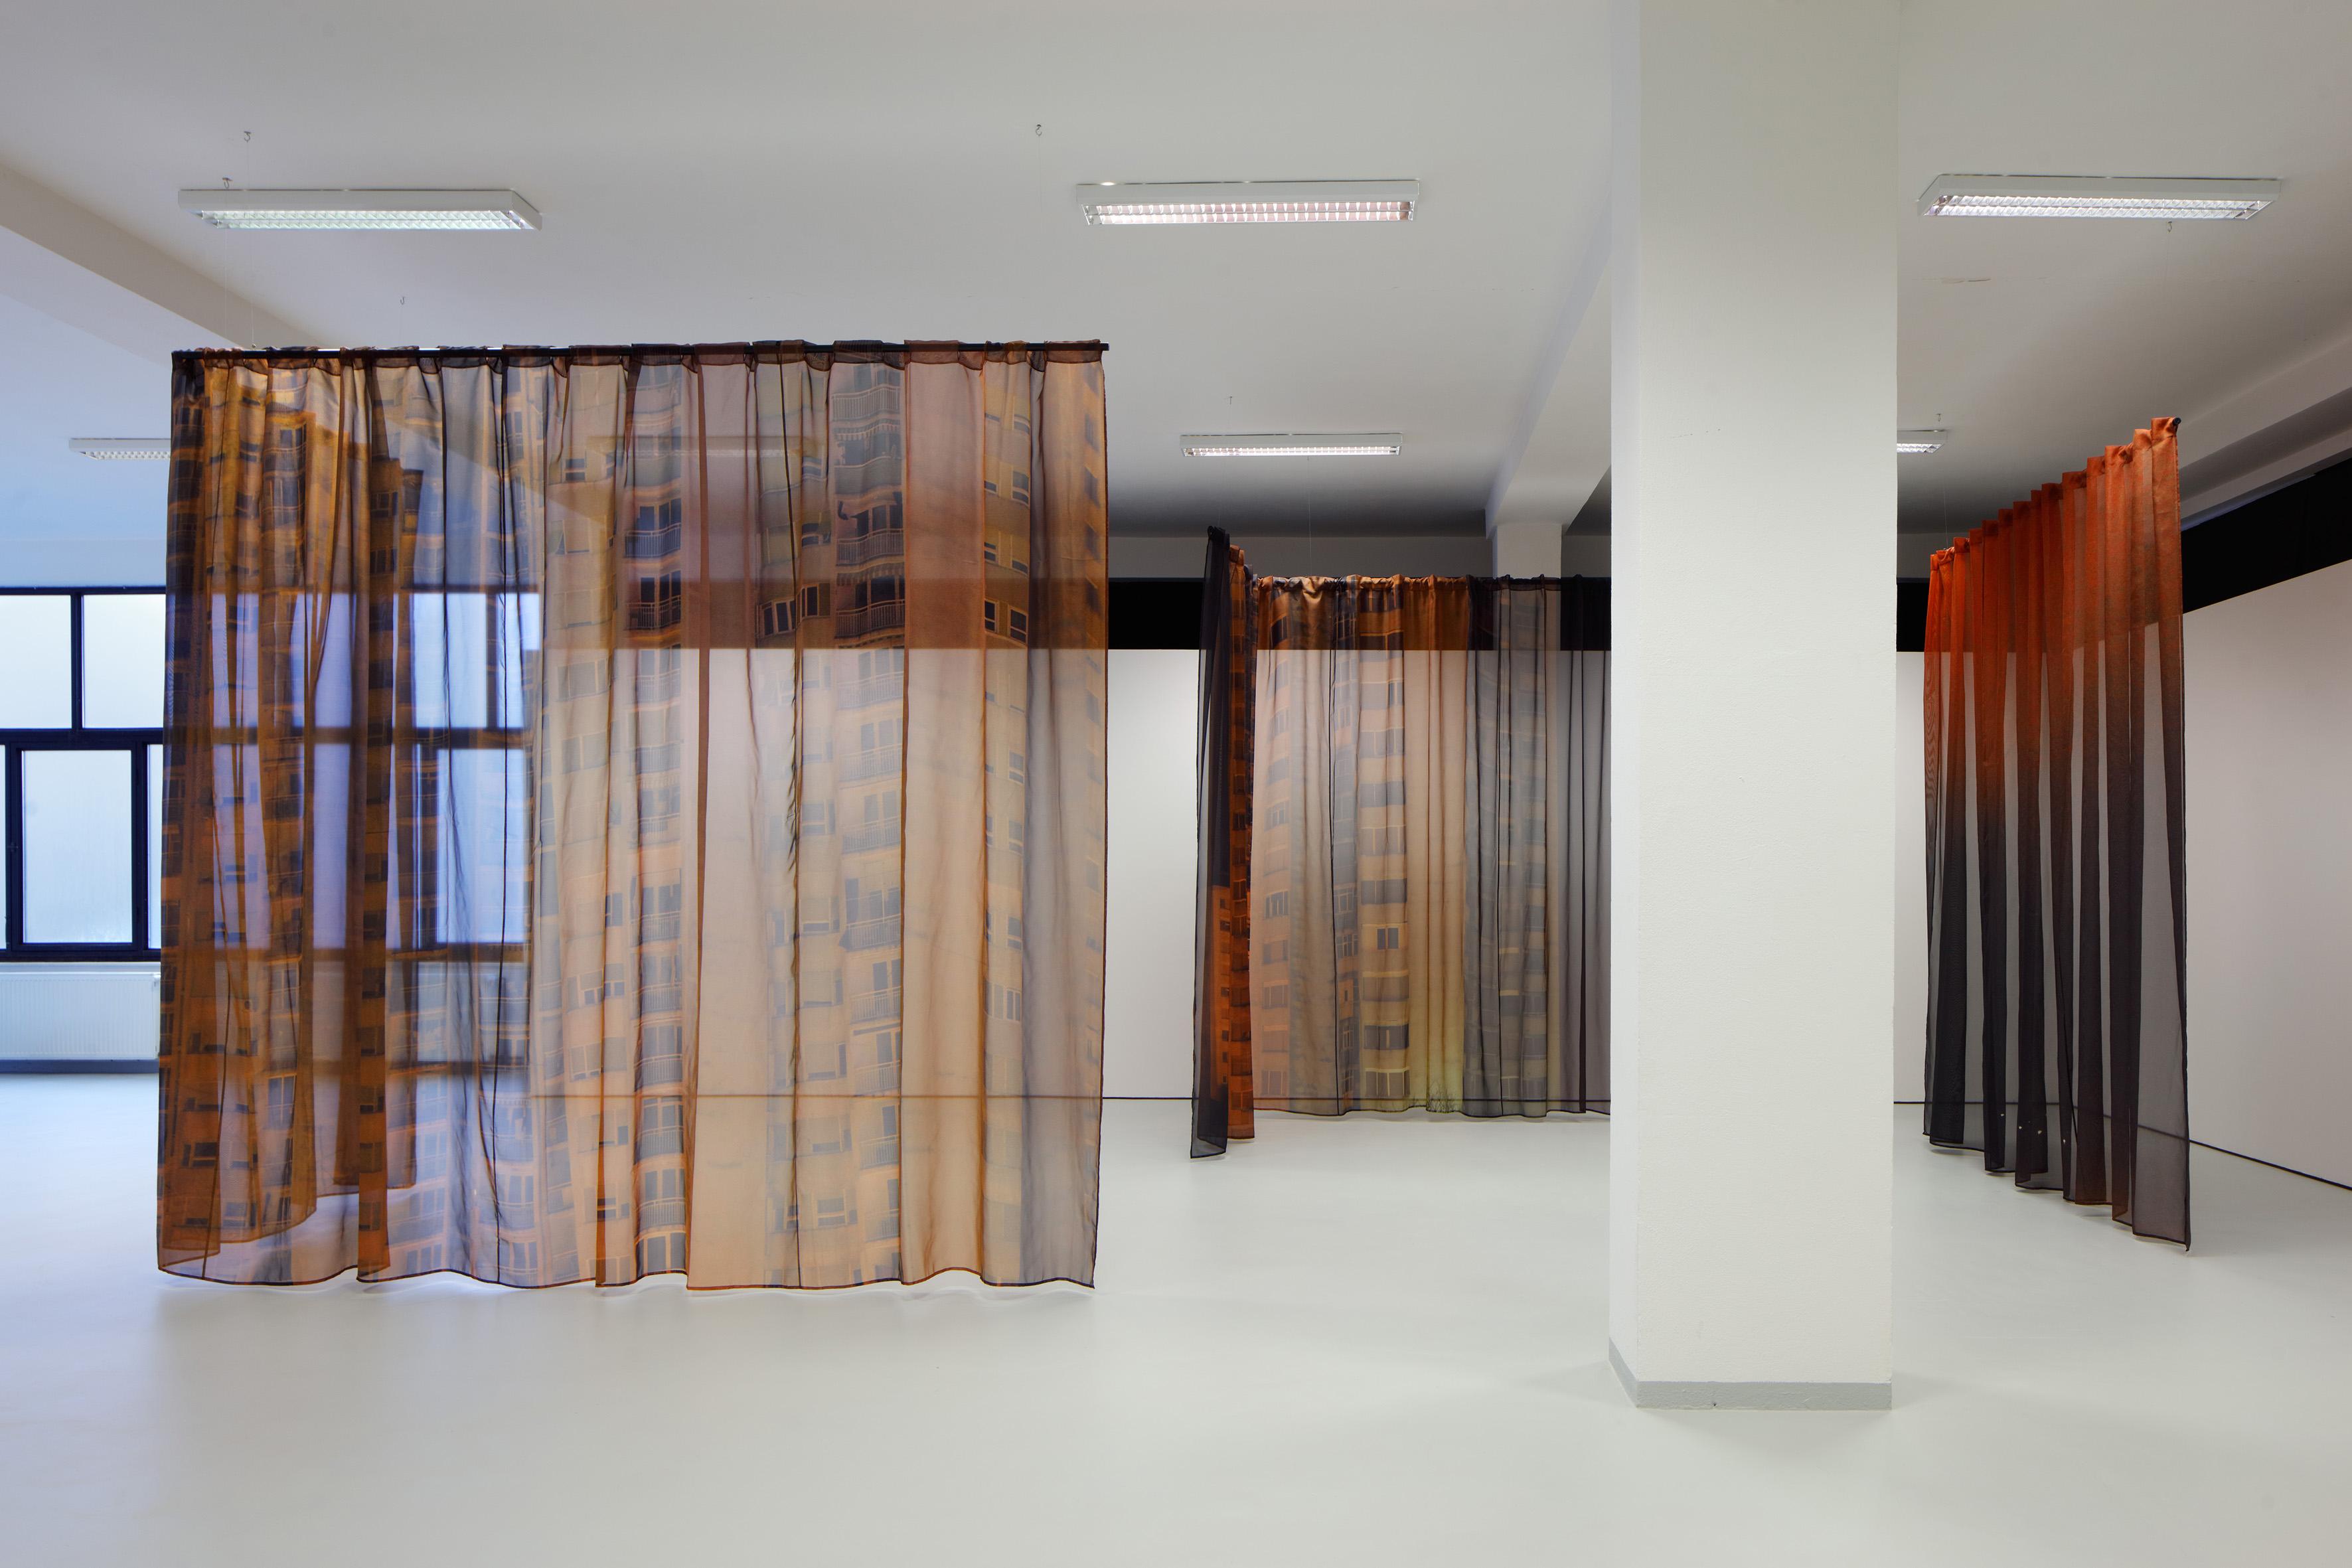 Ephemeropolis, instalacija, digitalni tisak na tekstilu, 2016. - ilustracija Eškinjina rada / Foto POLAK